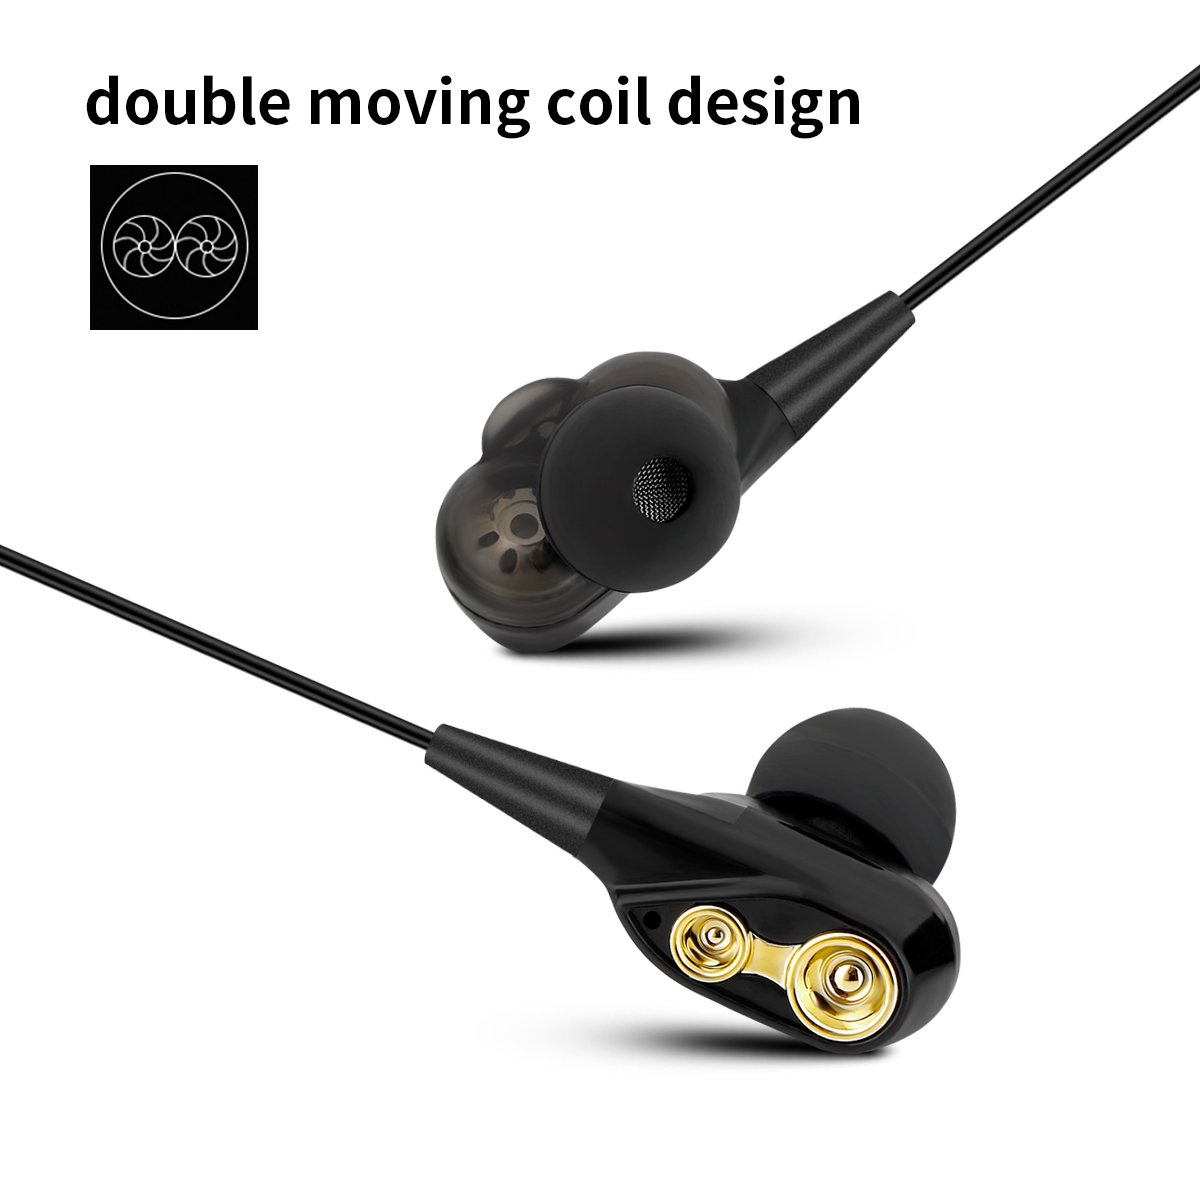 Type C Headphones, USB C Hi-Fi Stereo Digital Earbuds Sweatproof In-Ear Earphones with Mic Compatible with Google Pixel 2,Samsung Note 8,S8/S8+/S9,S9+, Moto Z, HTC U11, Essential PH-1 etc